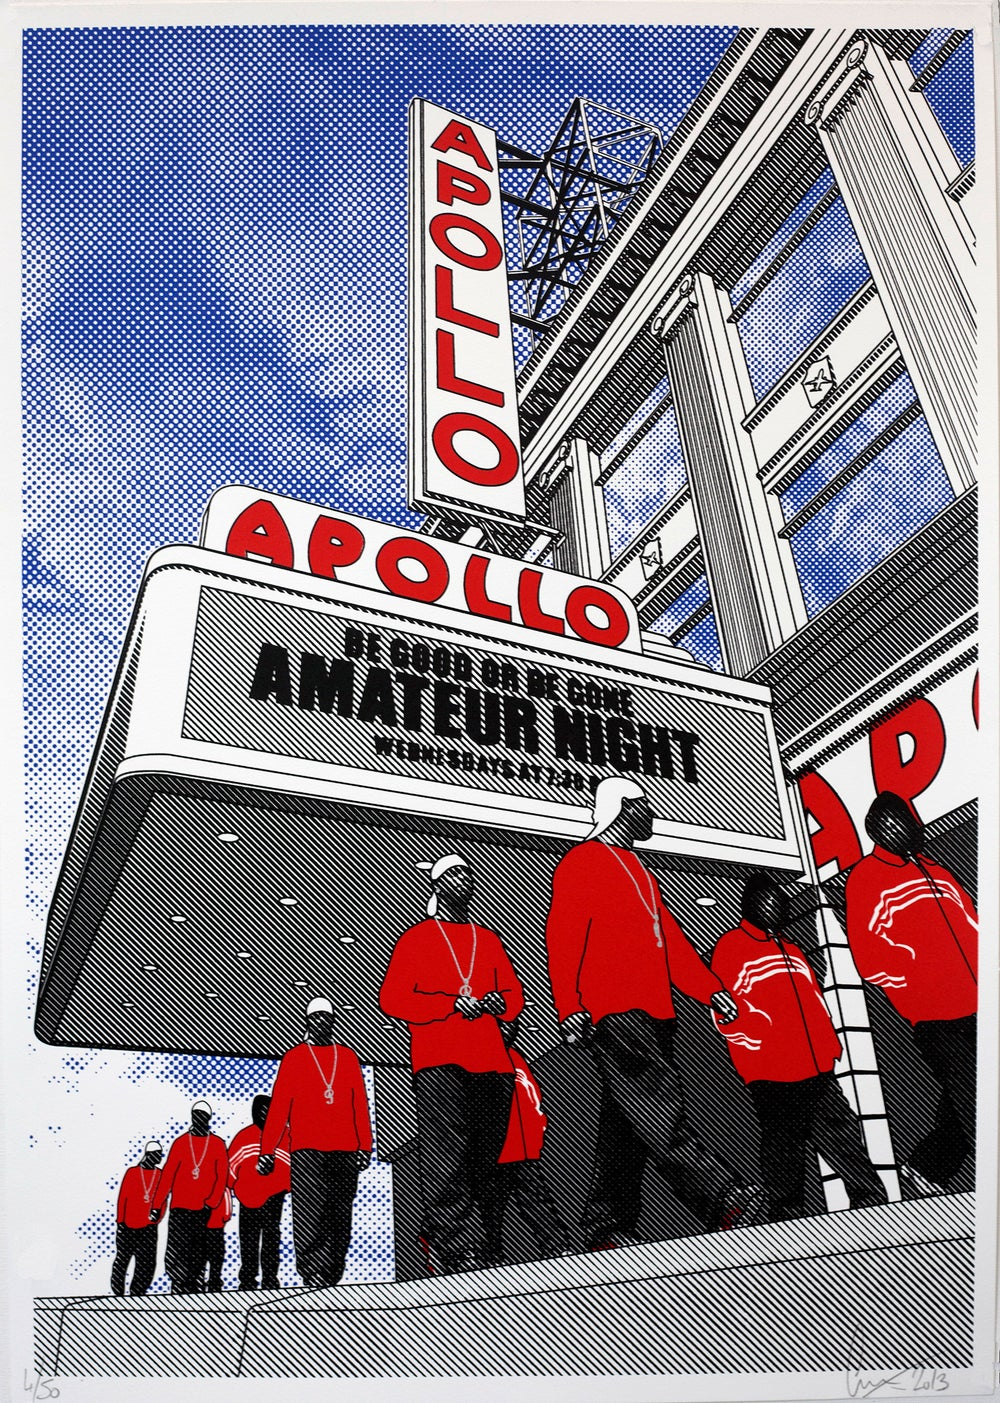 Image of Apollo screen print